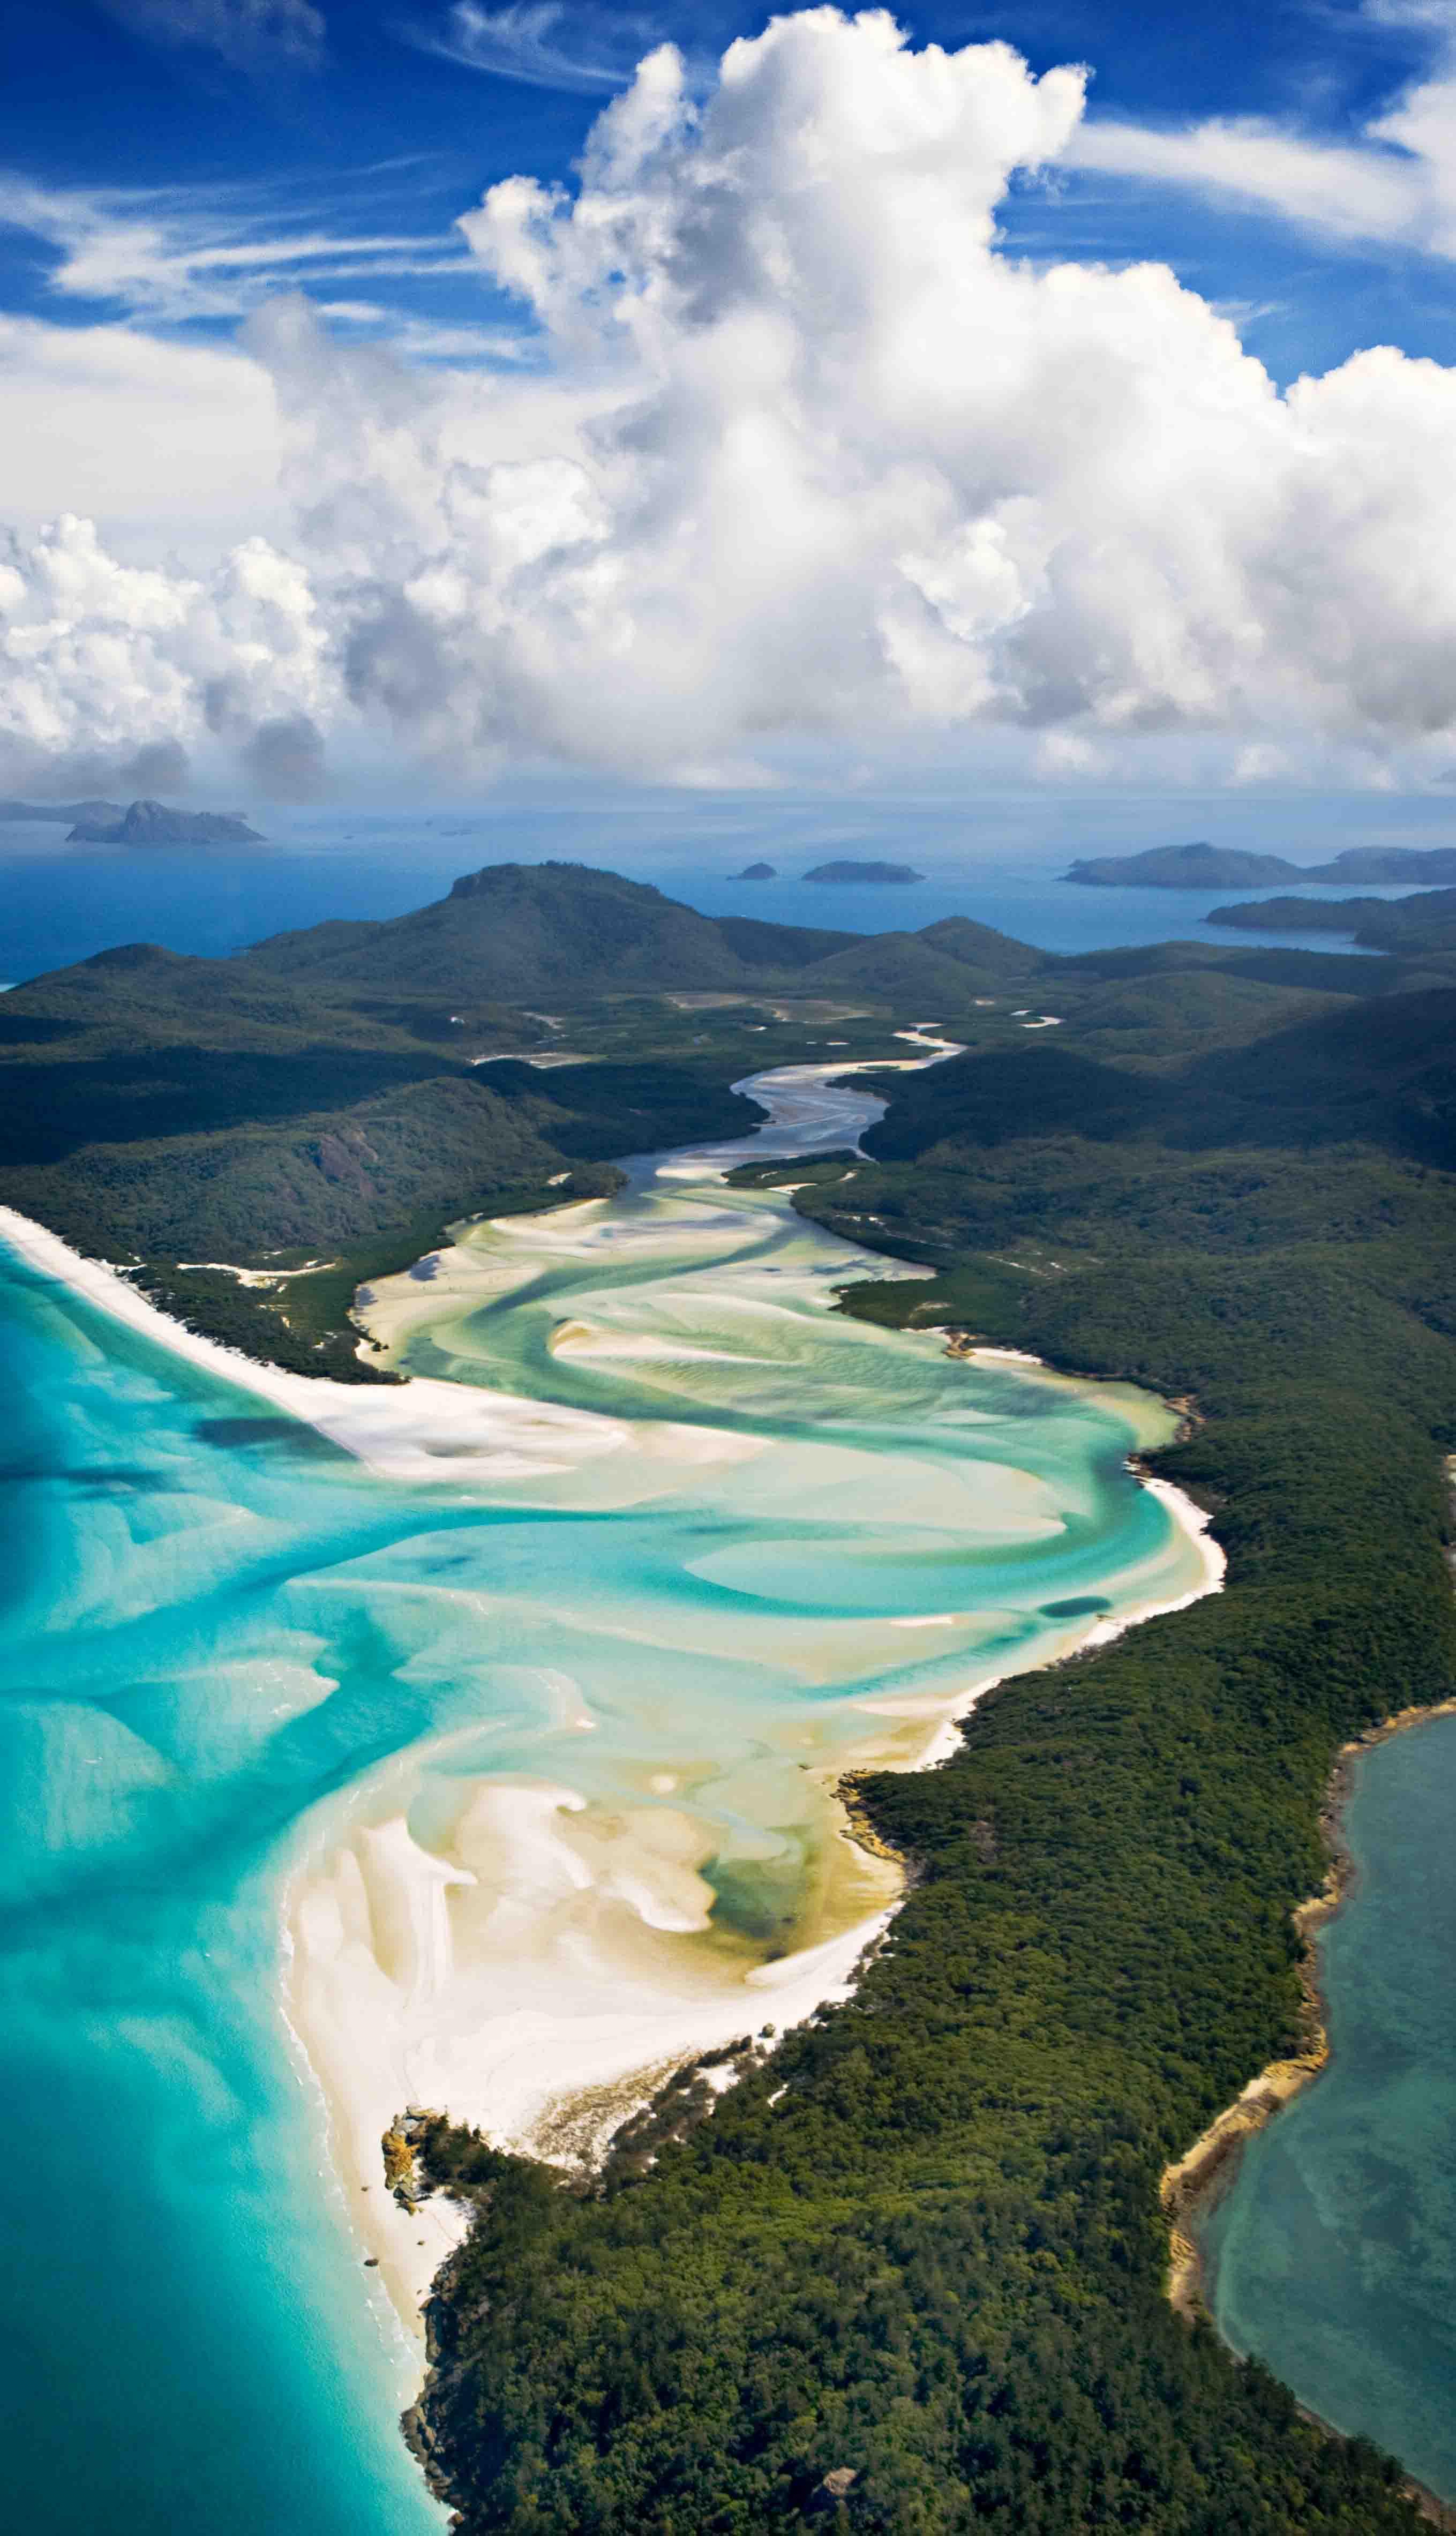 Whitehaven beach, Queesland, Australia by Ignacio Palacios